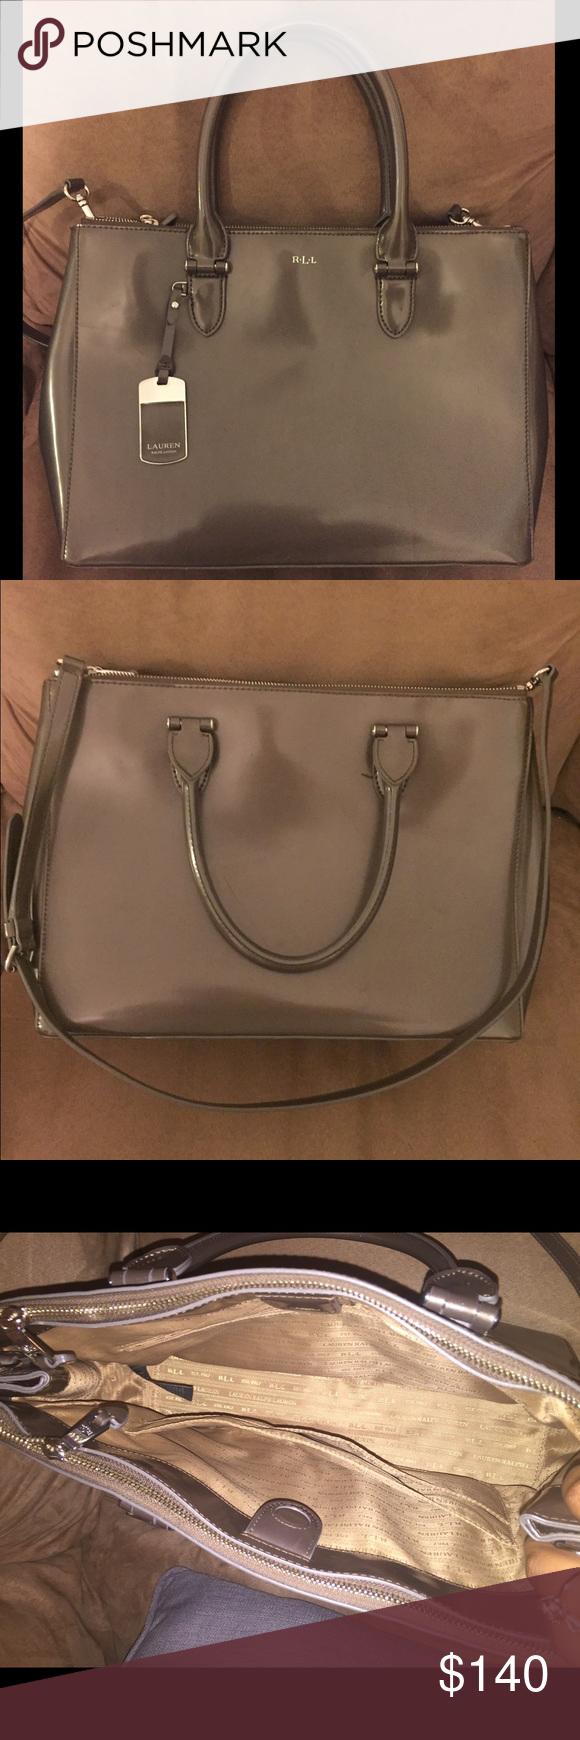 Selling this Women s Ralph Lauren Double Zip Satchel Tote bag on Poshmark!  My username is  h28fierce.  shopmycloset  poshmark  fashion  shopping   style ... 7cc64e12e3